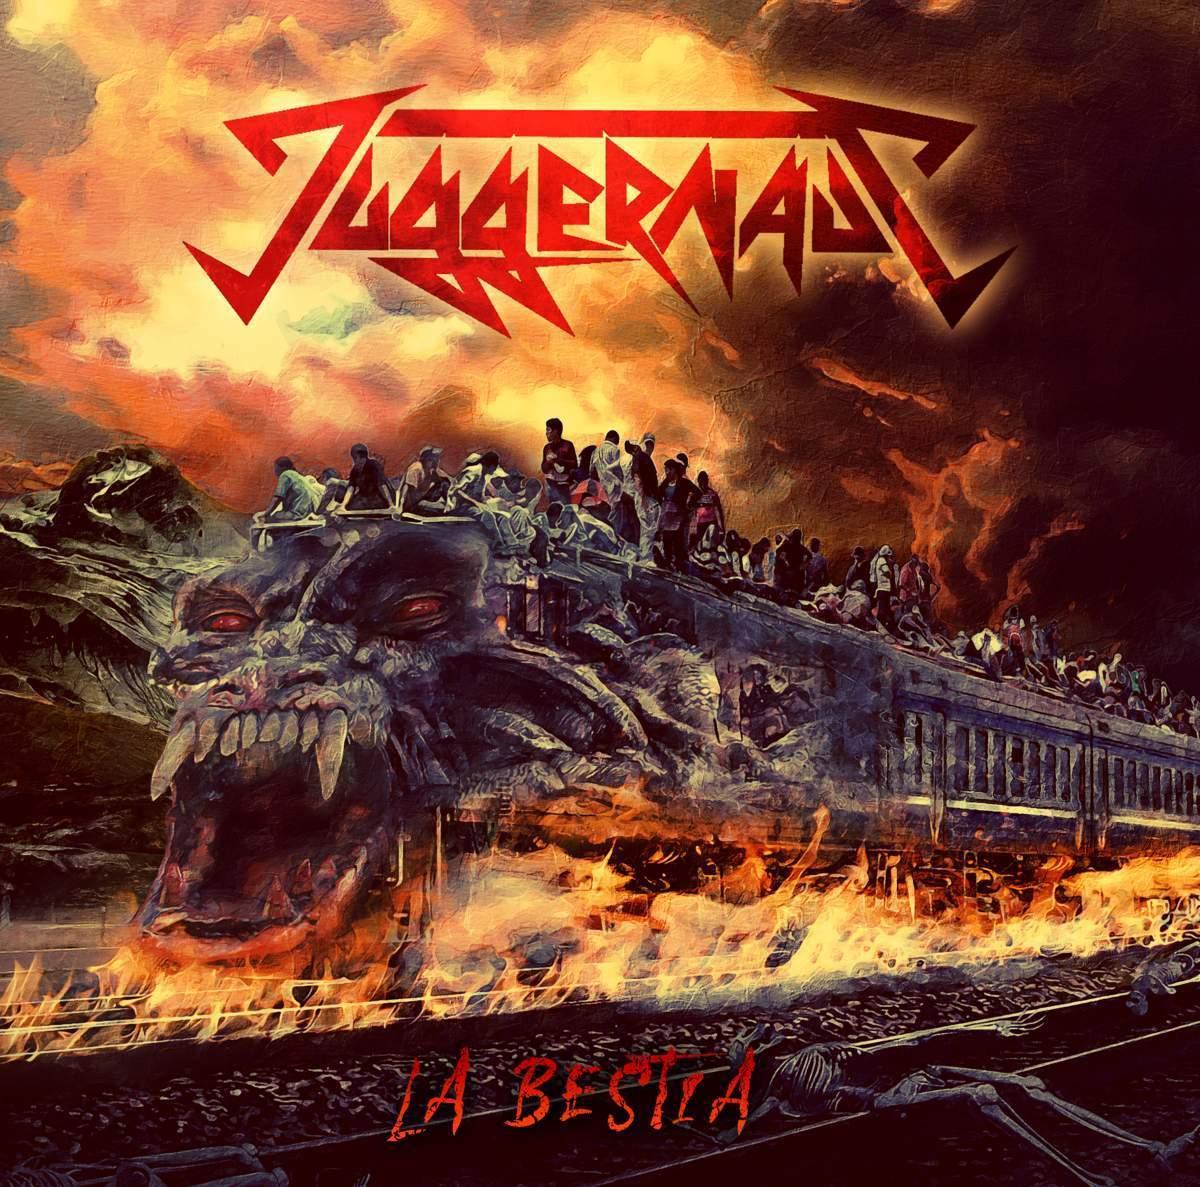 "Juggernaut: Ouça agora o novo álbum ""La Bestia"""